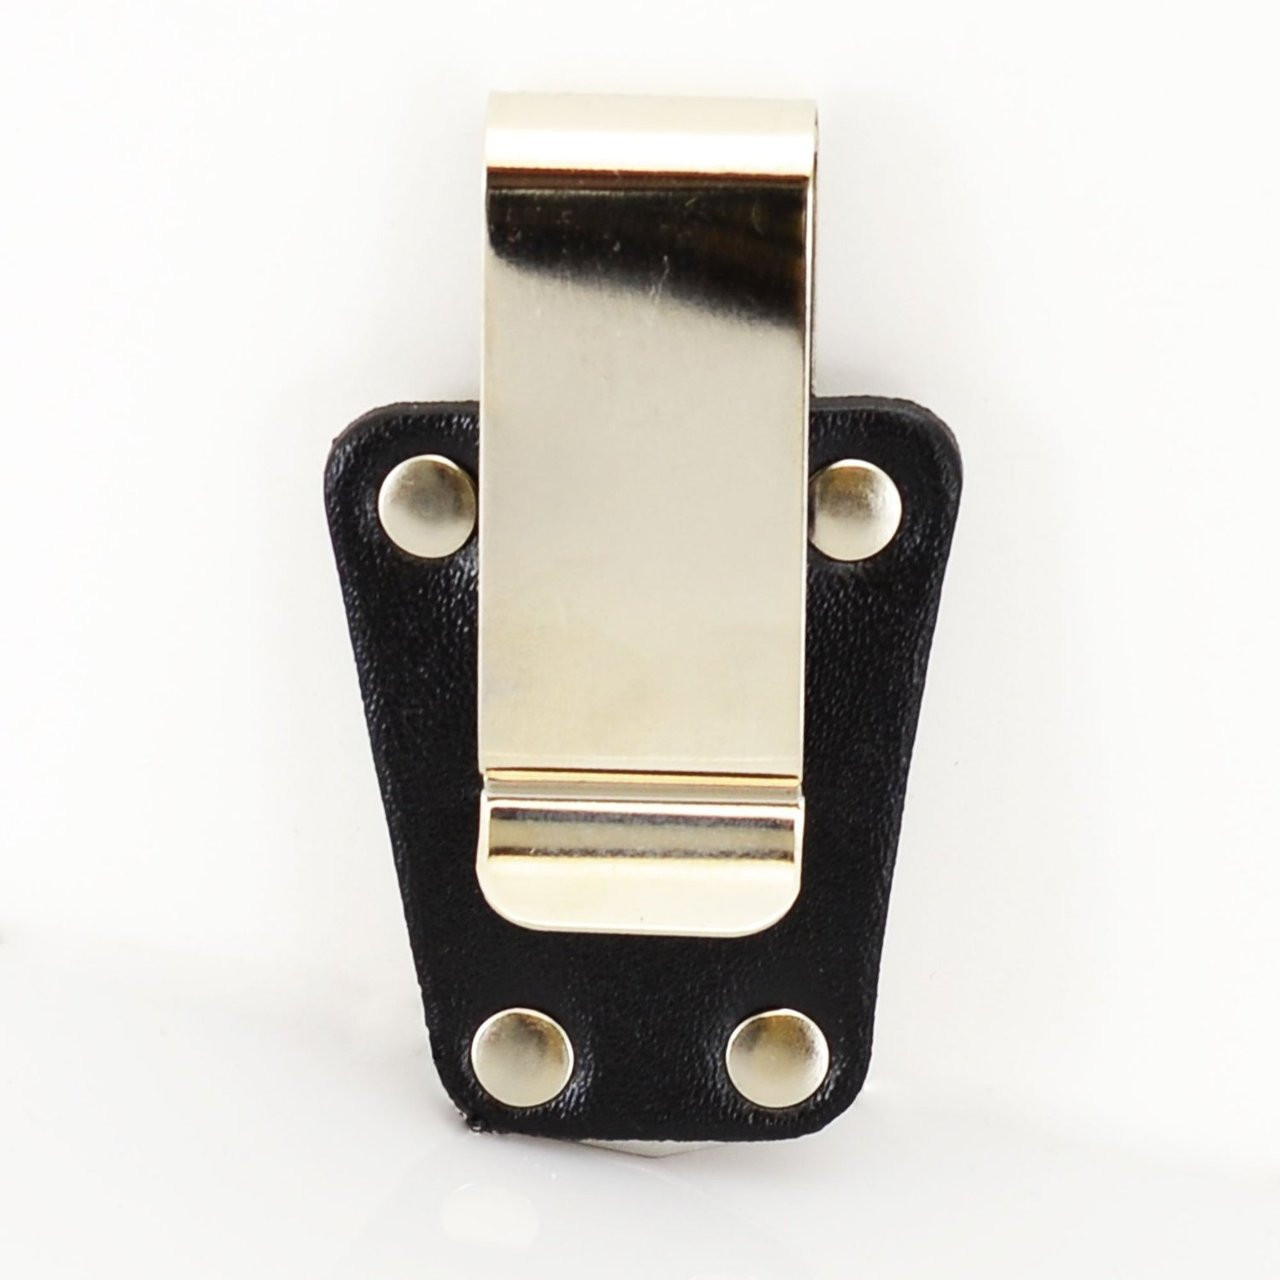 turtleback replacement belt clip metal heavy duty. Black Bedroom Furniture Sets. Home Design Ideas